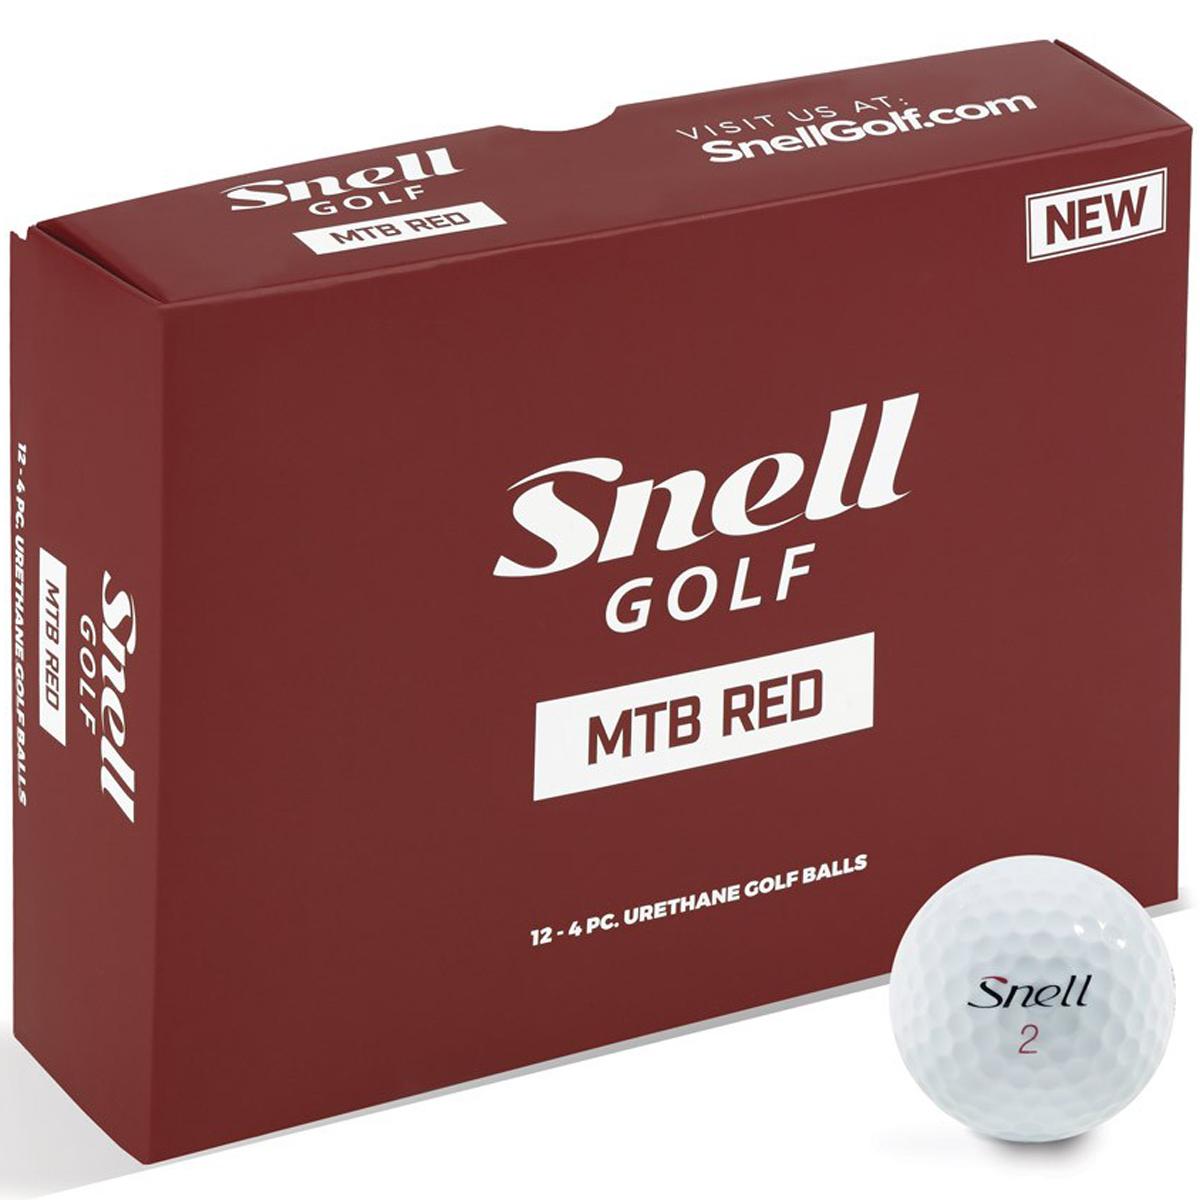 MTB RED ボール